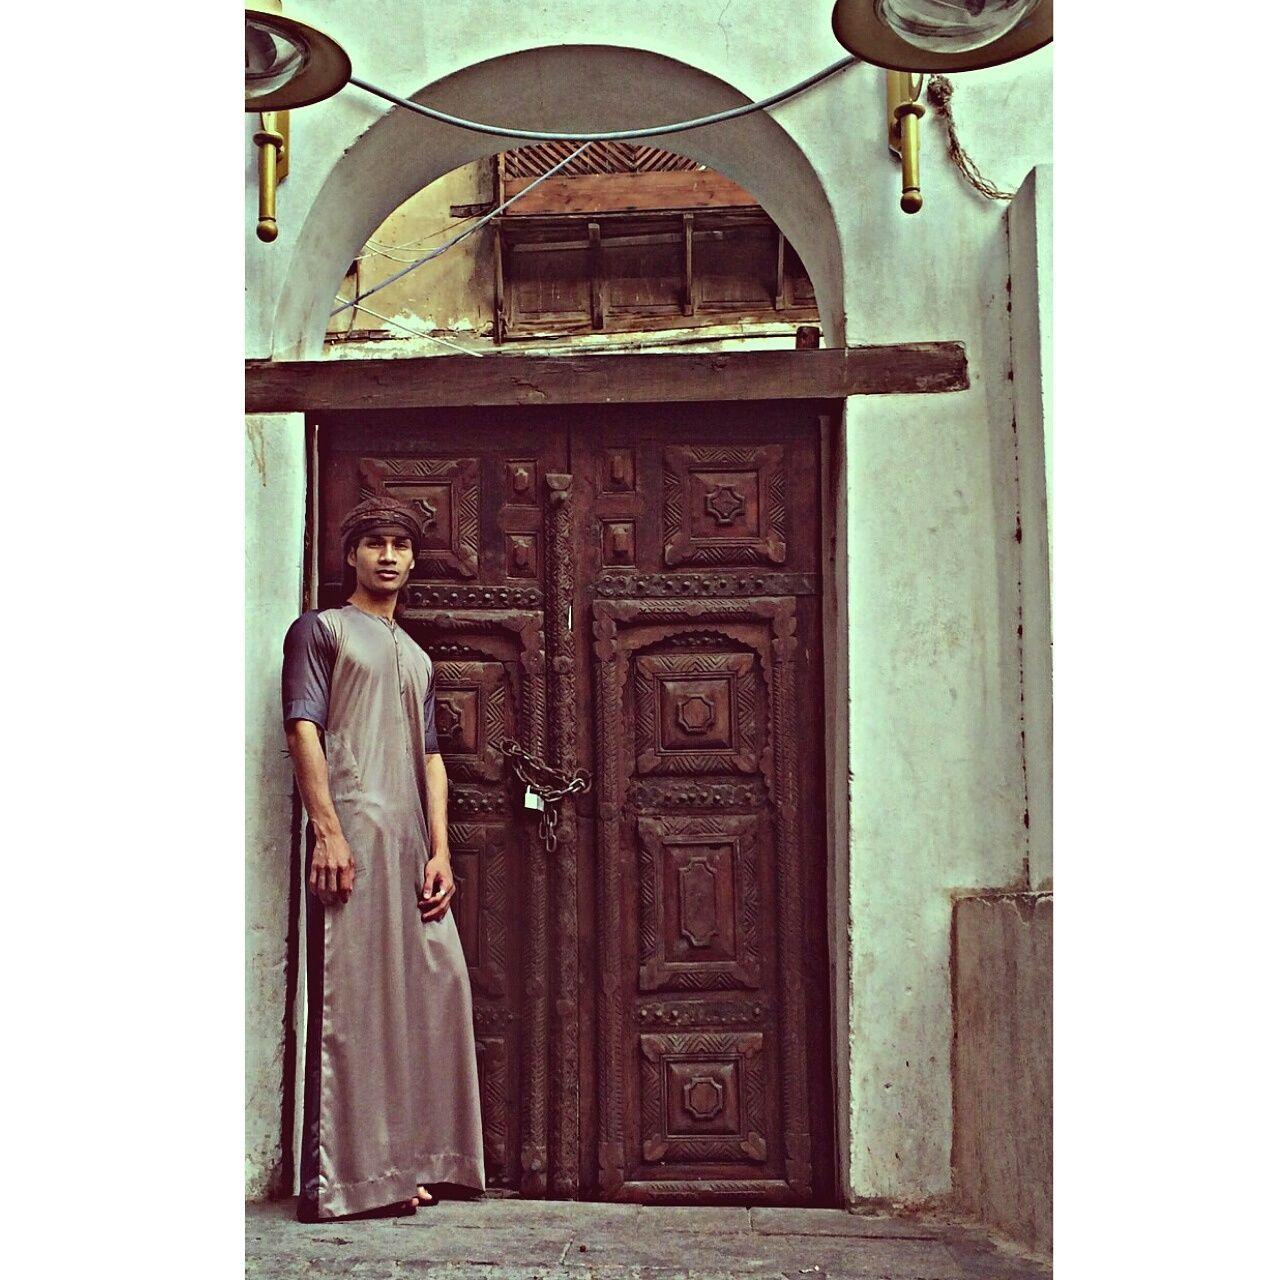 Jeddah_ksa Albalad Saudi Arabia Thobe Photography Model History Festive Season Ramadhan Travel